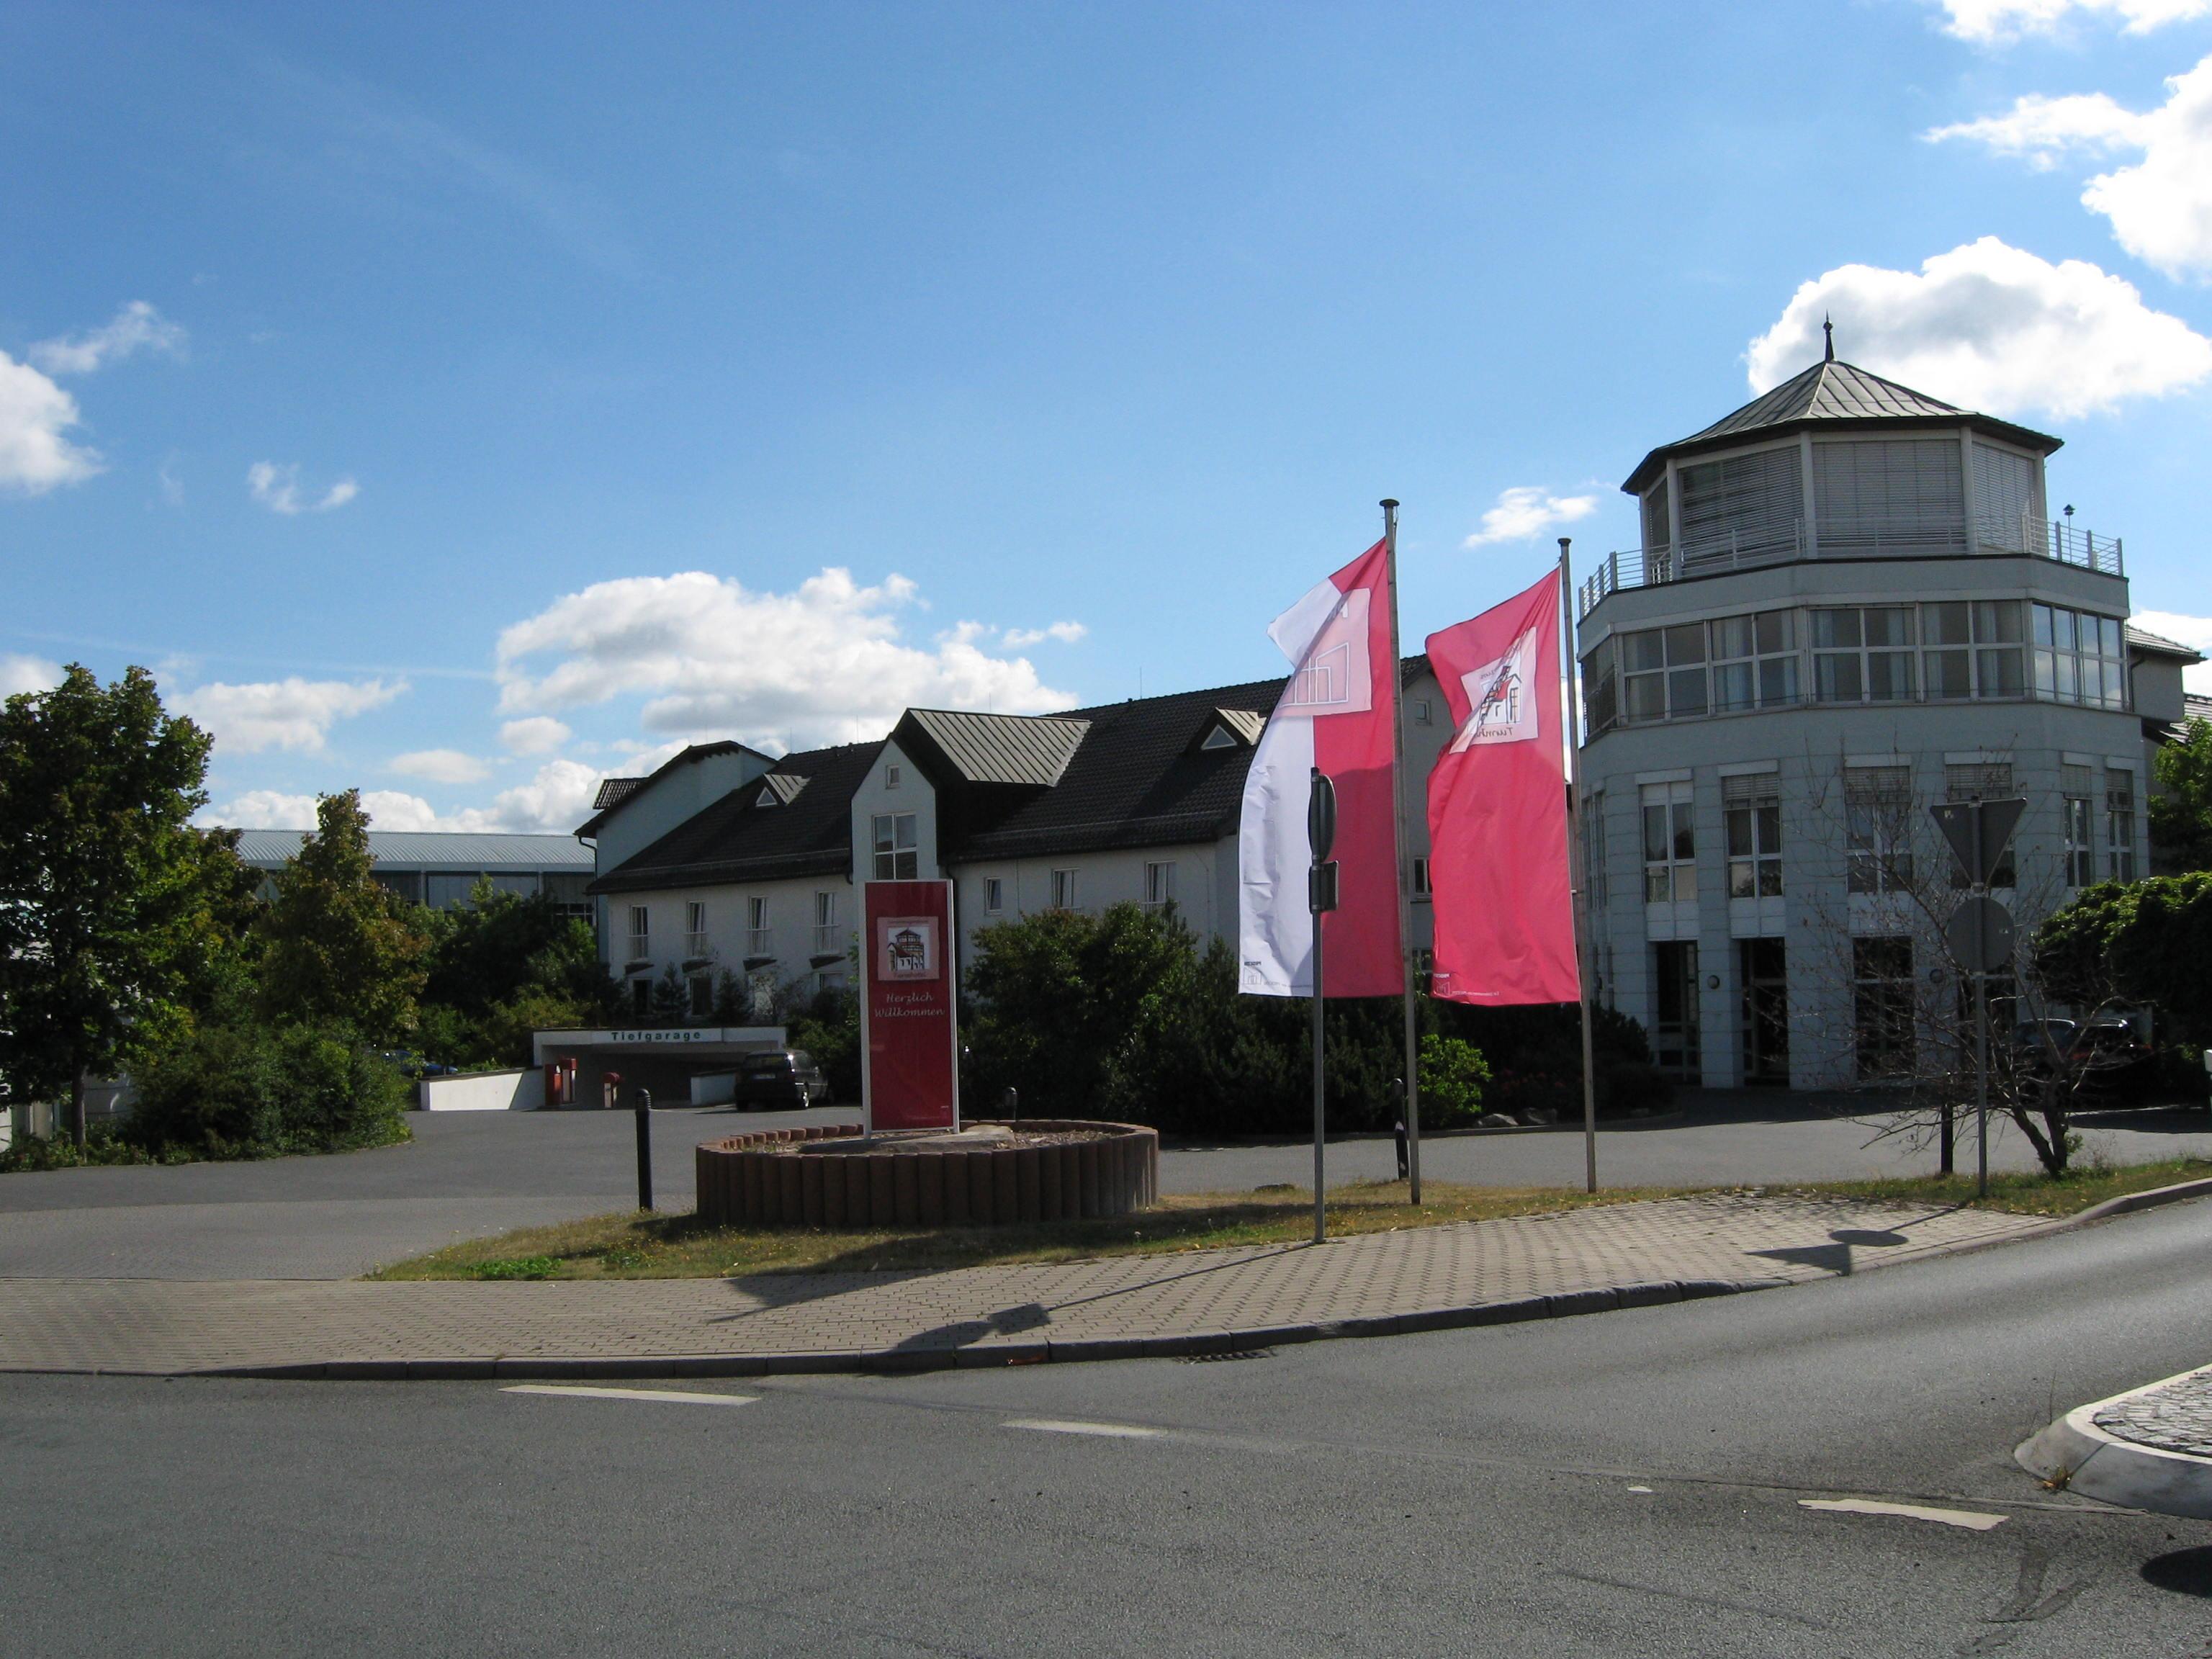 Seniorenzentrum Turmhotel